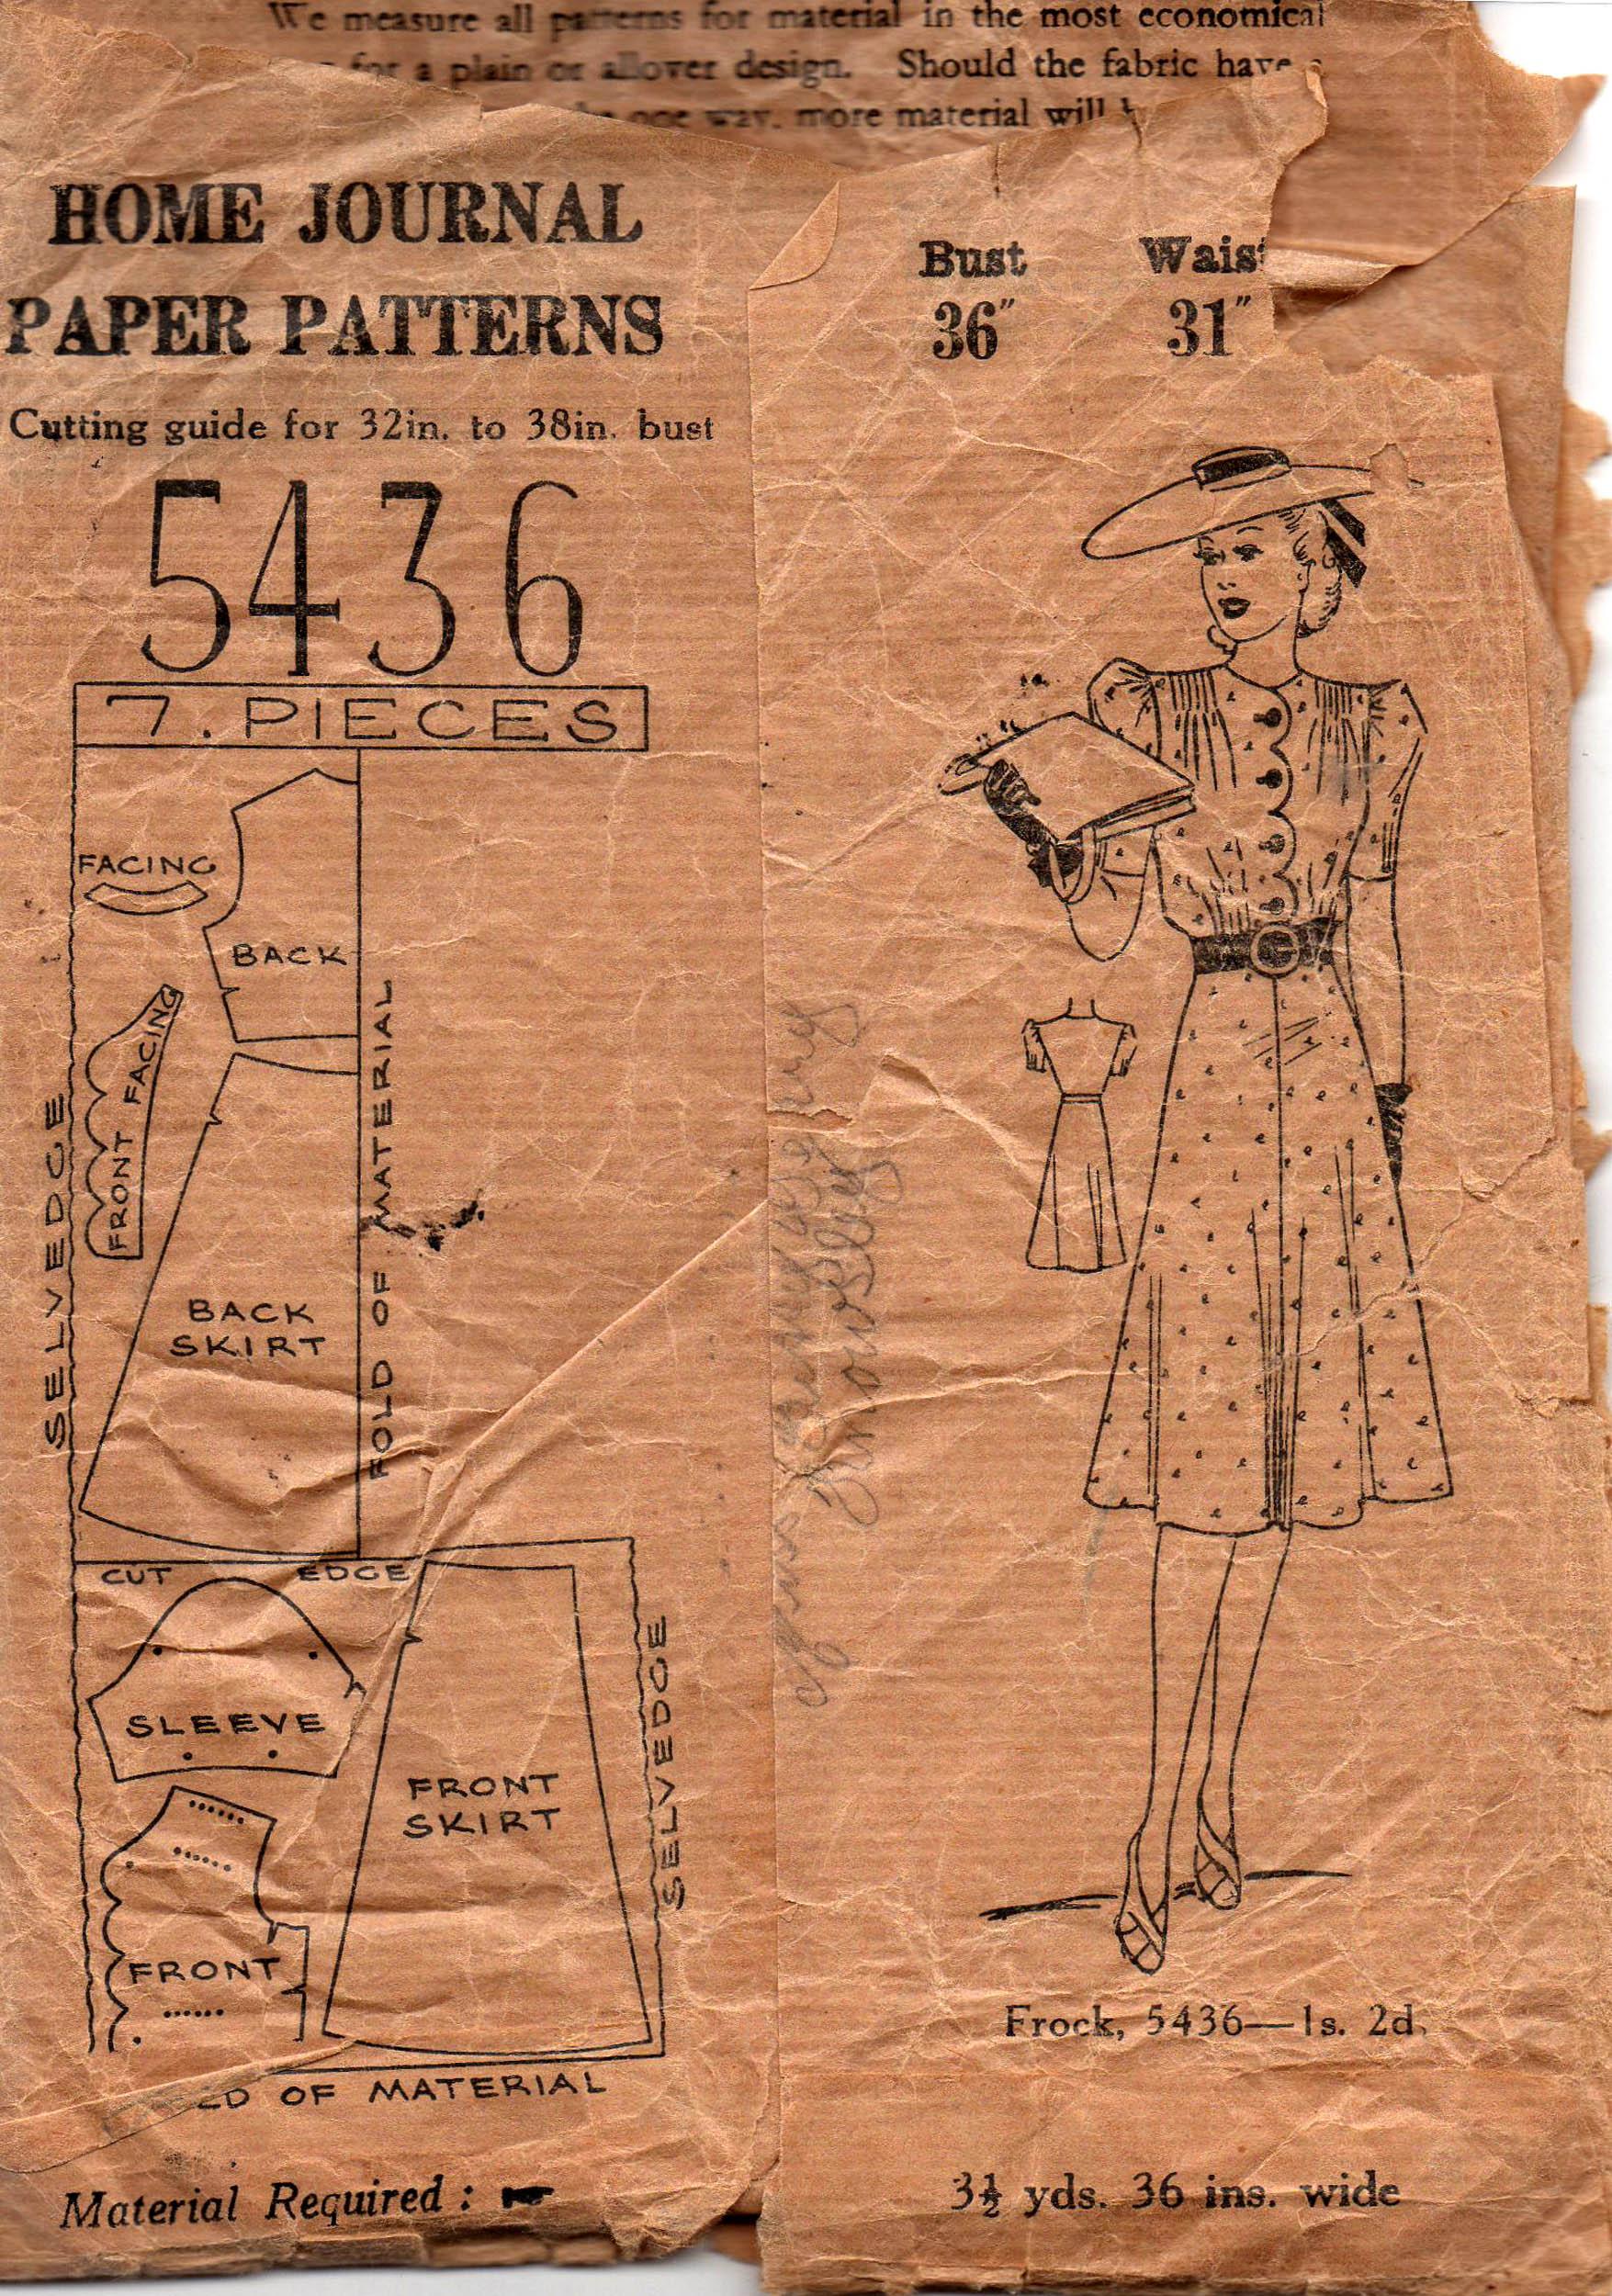 Australian Home Journal 5436